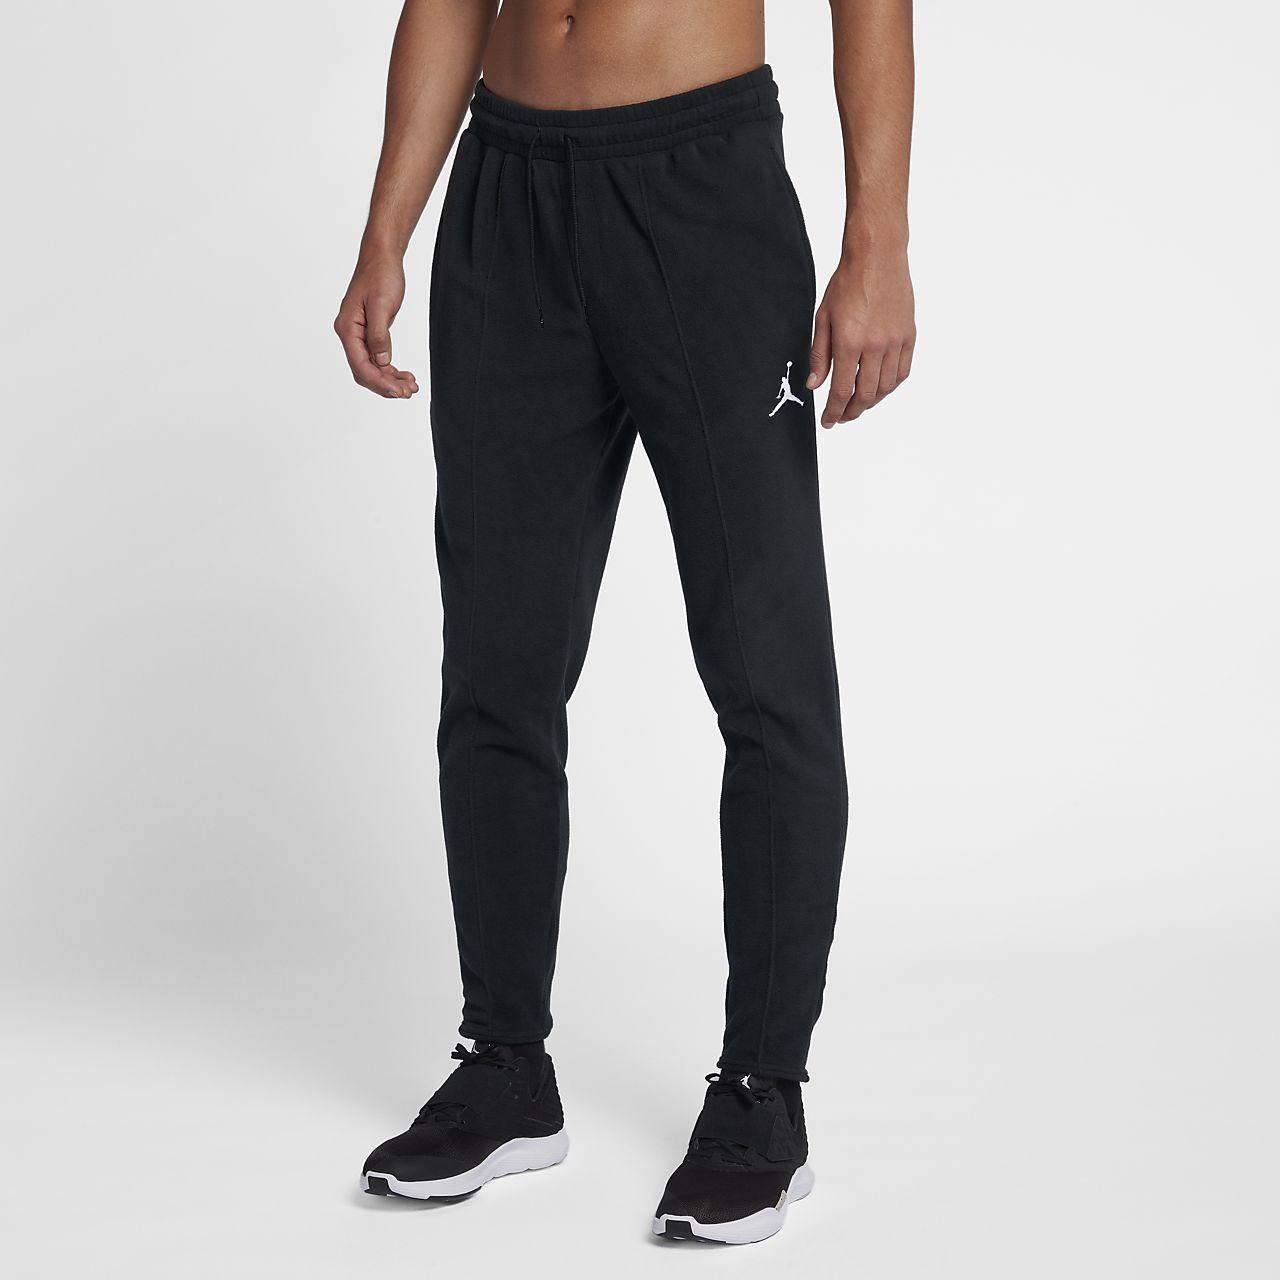 ece0b4e80cbda4 Jordan Therma 23 Alpha Men s Training Trousers. Nike.com NZ